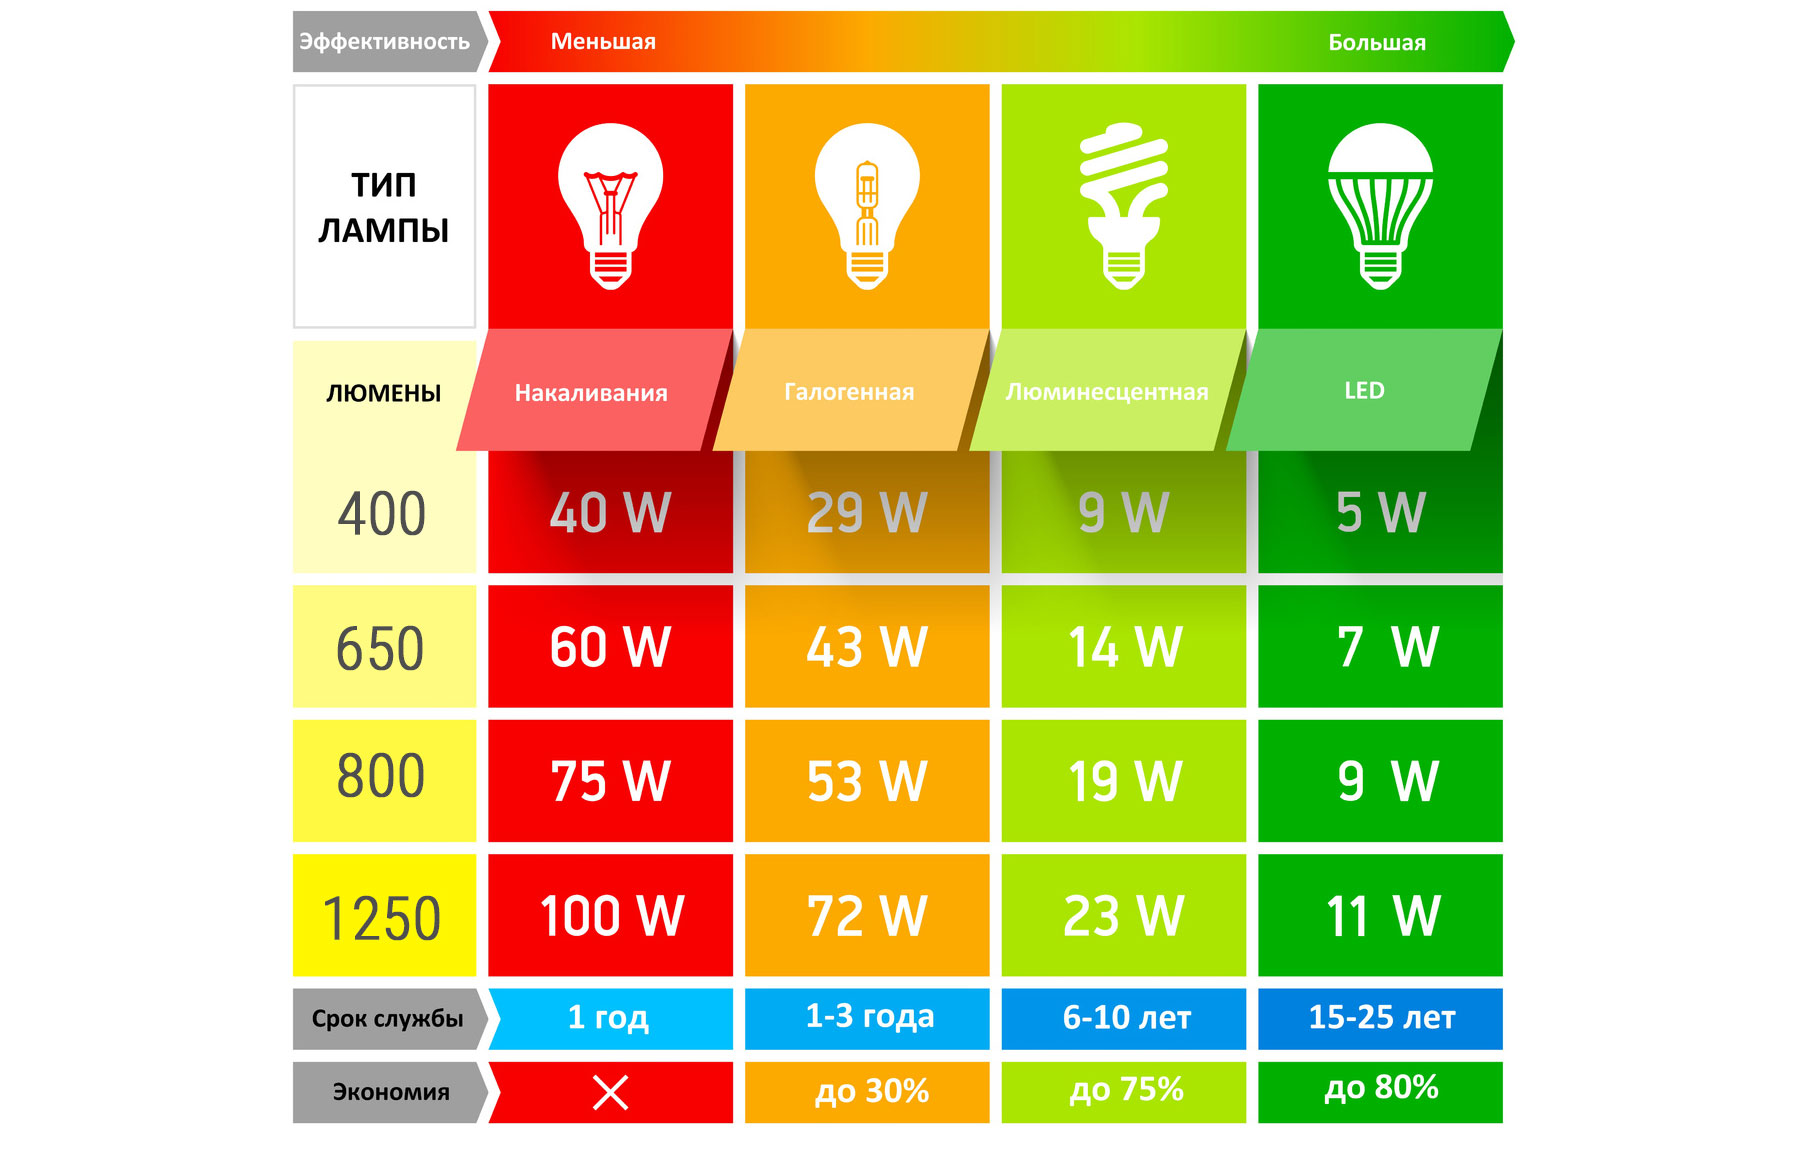 таблица эффективности ламп